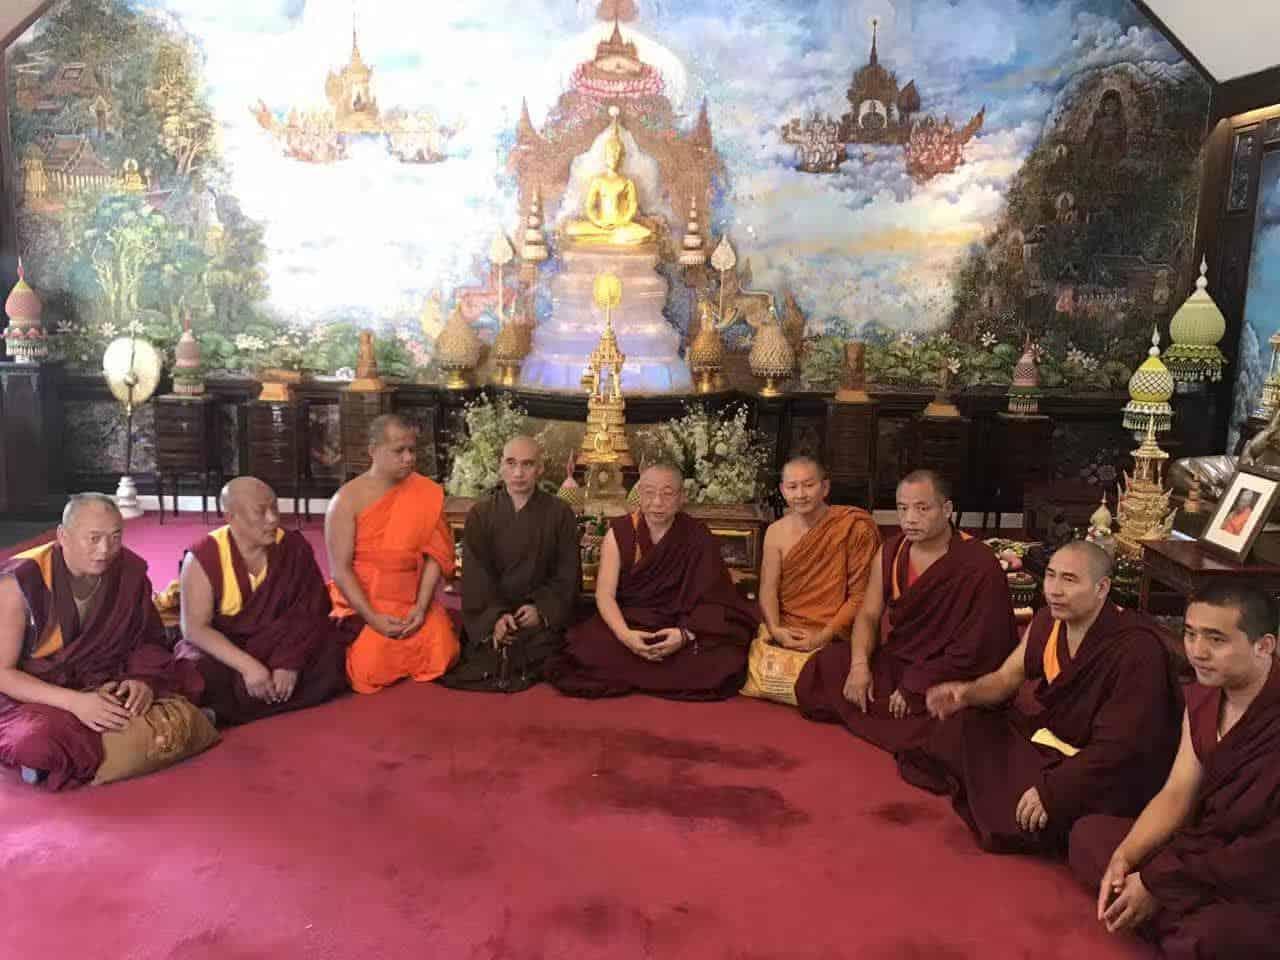 Gosok Rinpoche Thailand 2017 T023 d5c41b291edc44a40a4b65dd72457e8